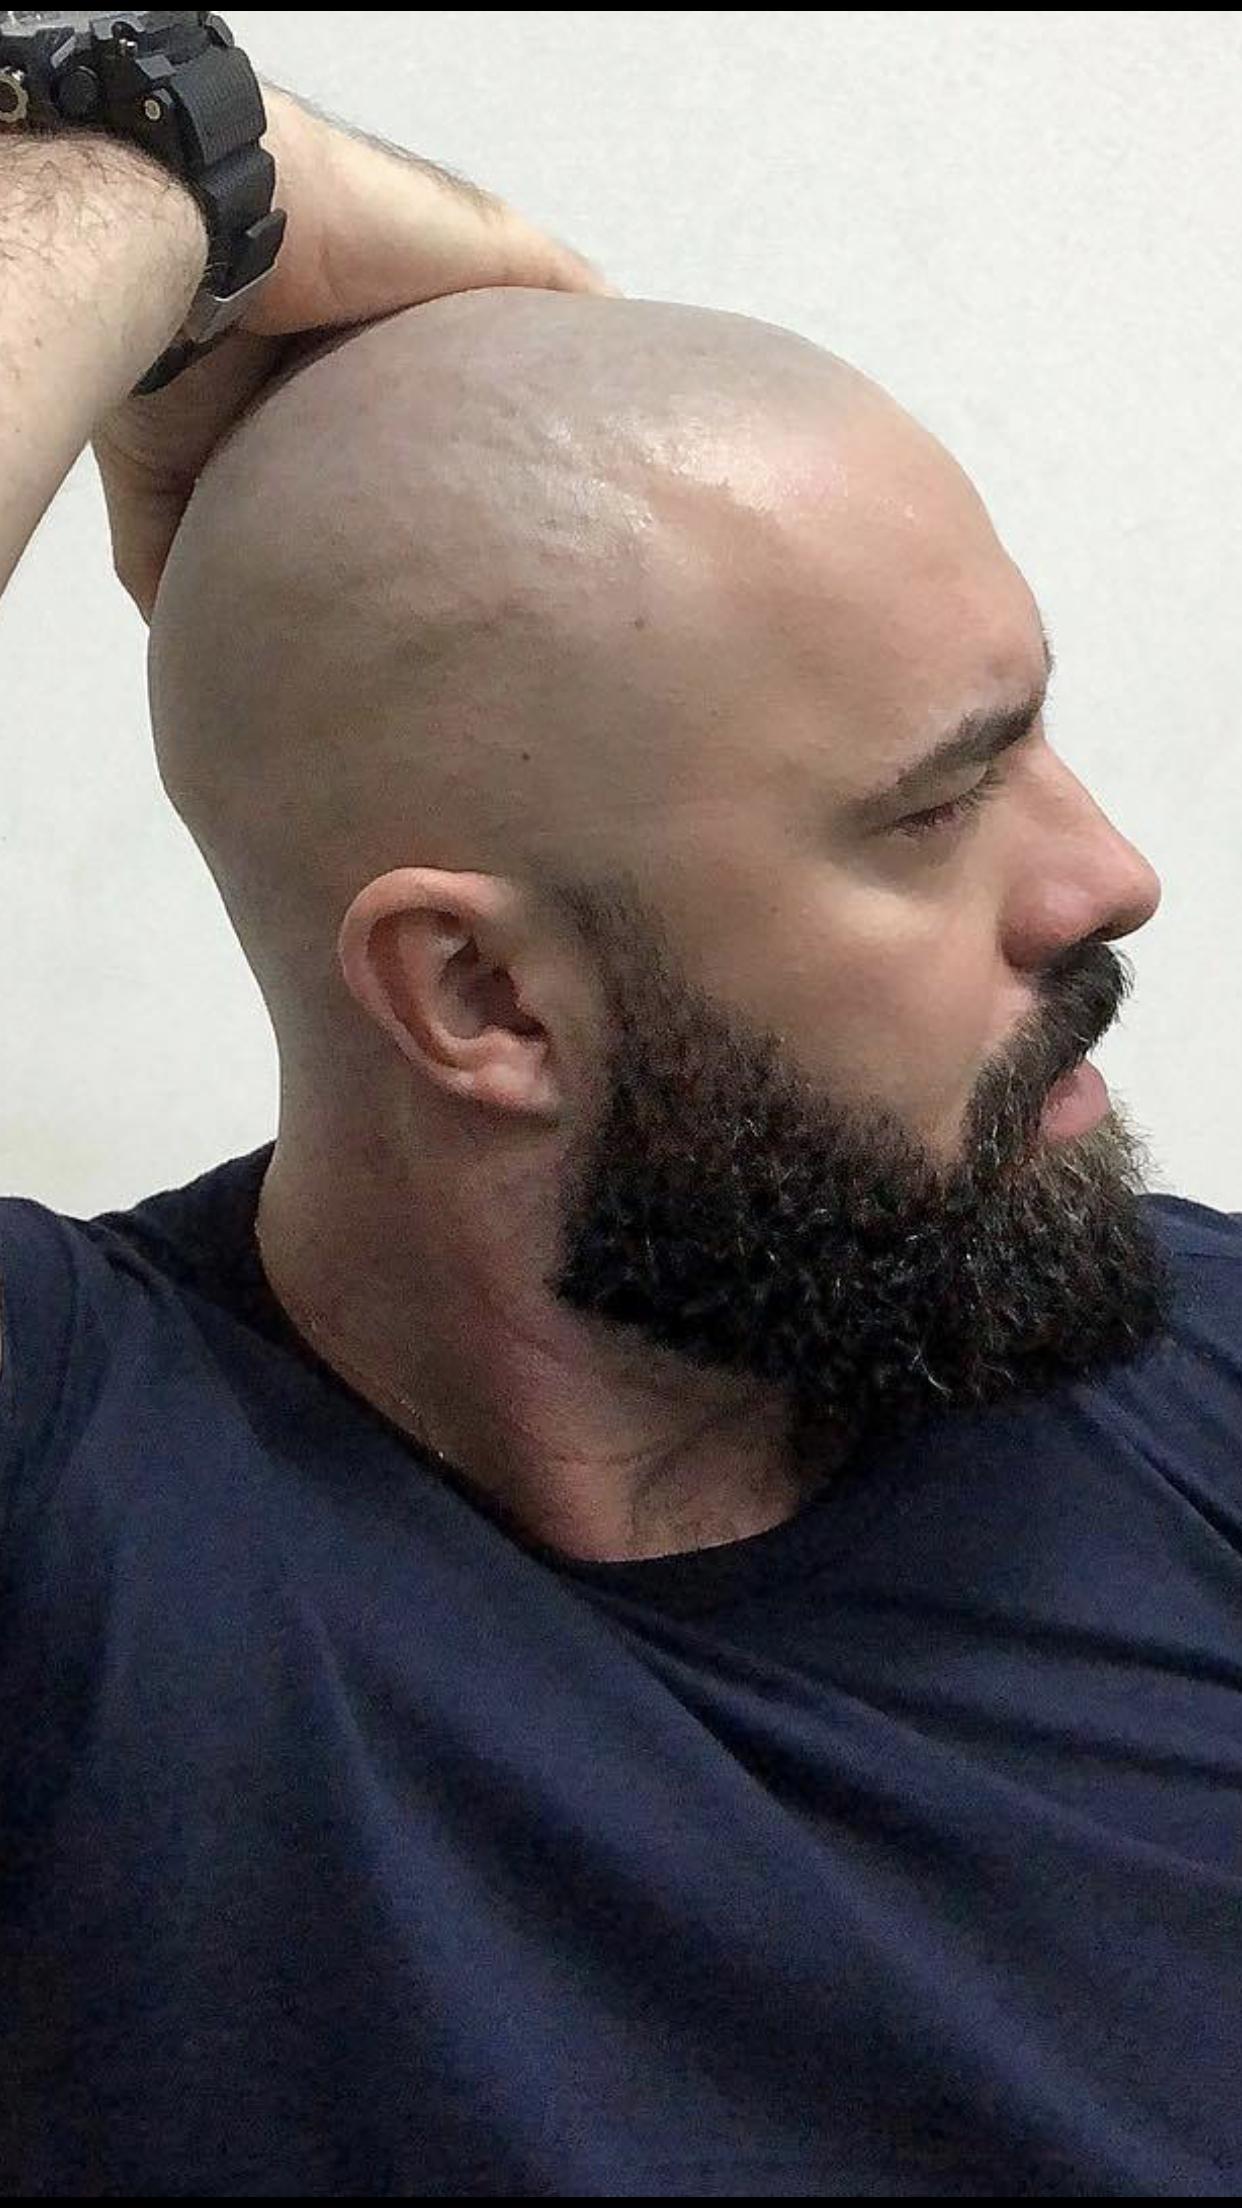 Pin By Chad Perkins On Beards Full Length Bald Men With Beards Bald With Beard Shaved Head With Beard